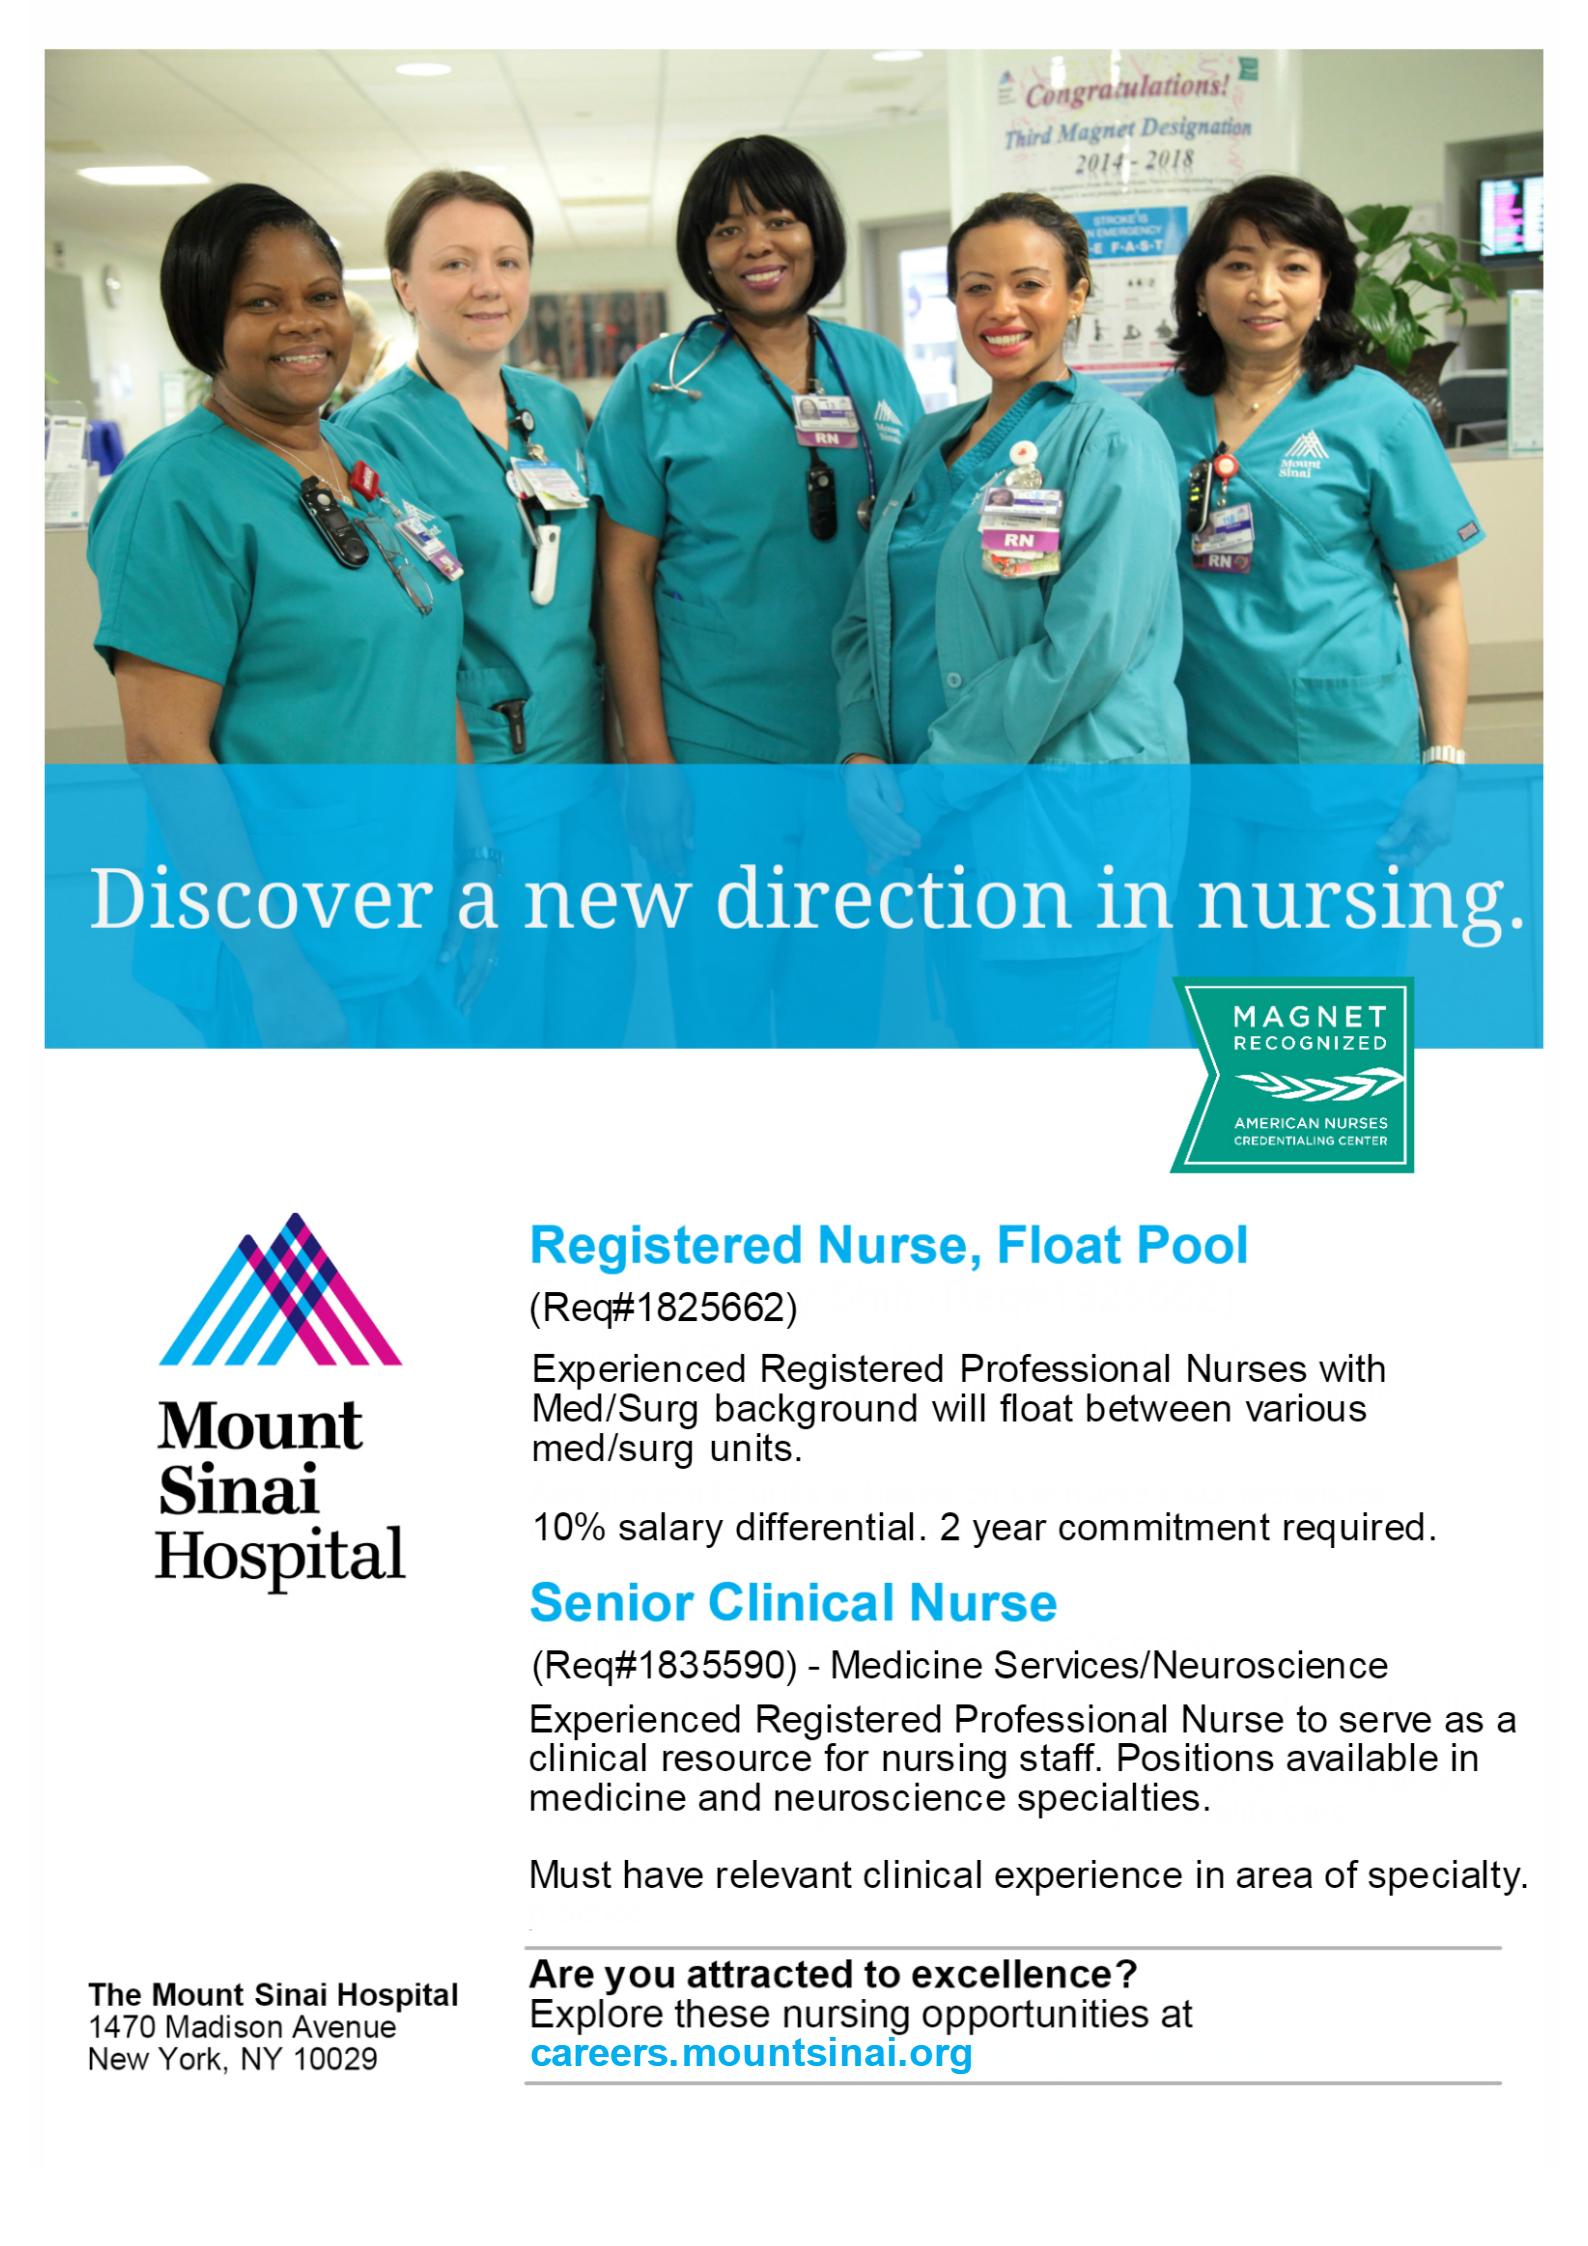 Nursing_Intranet